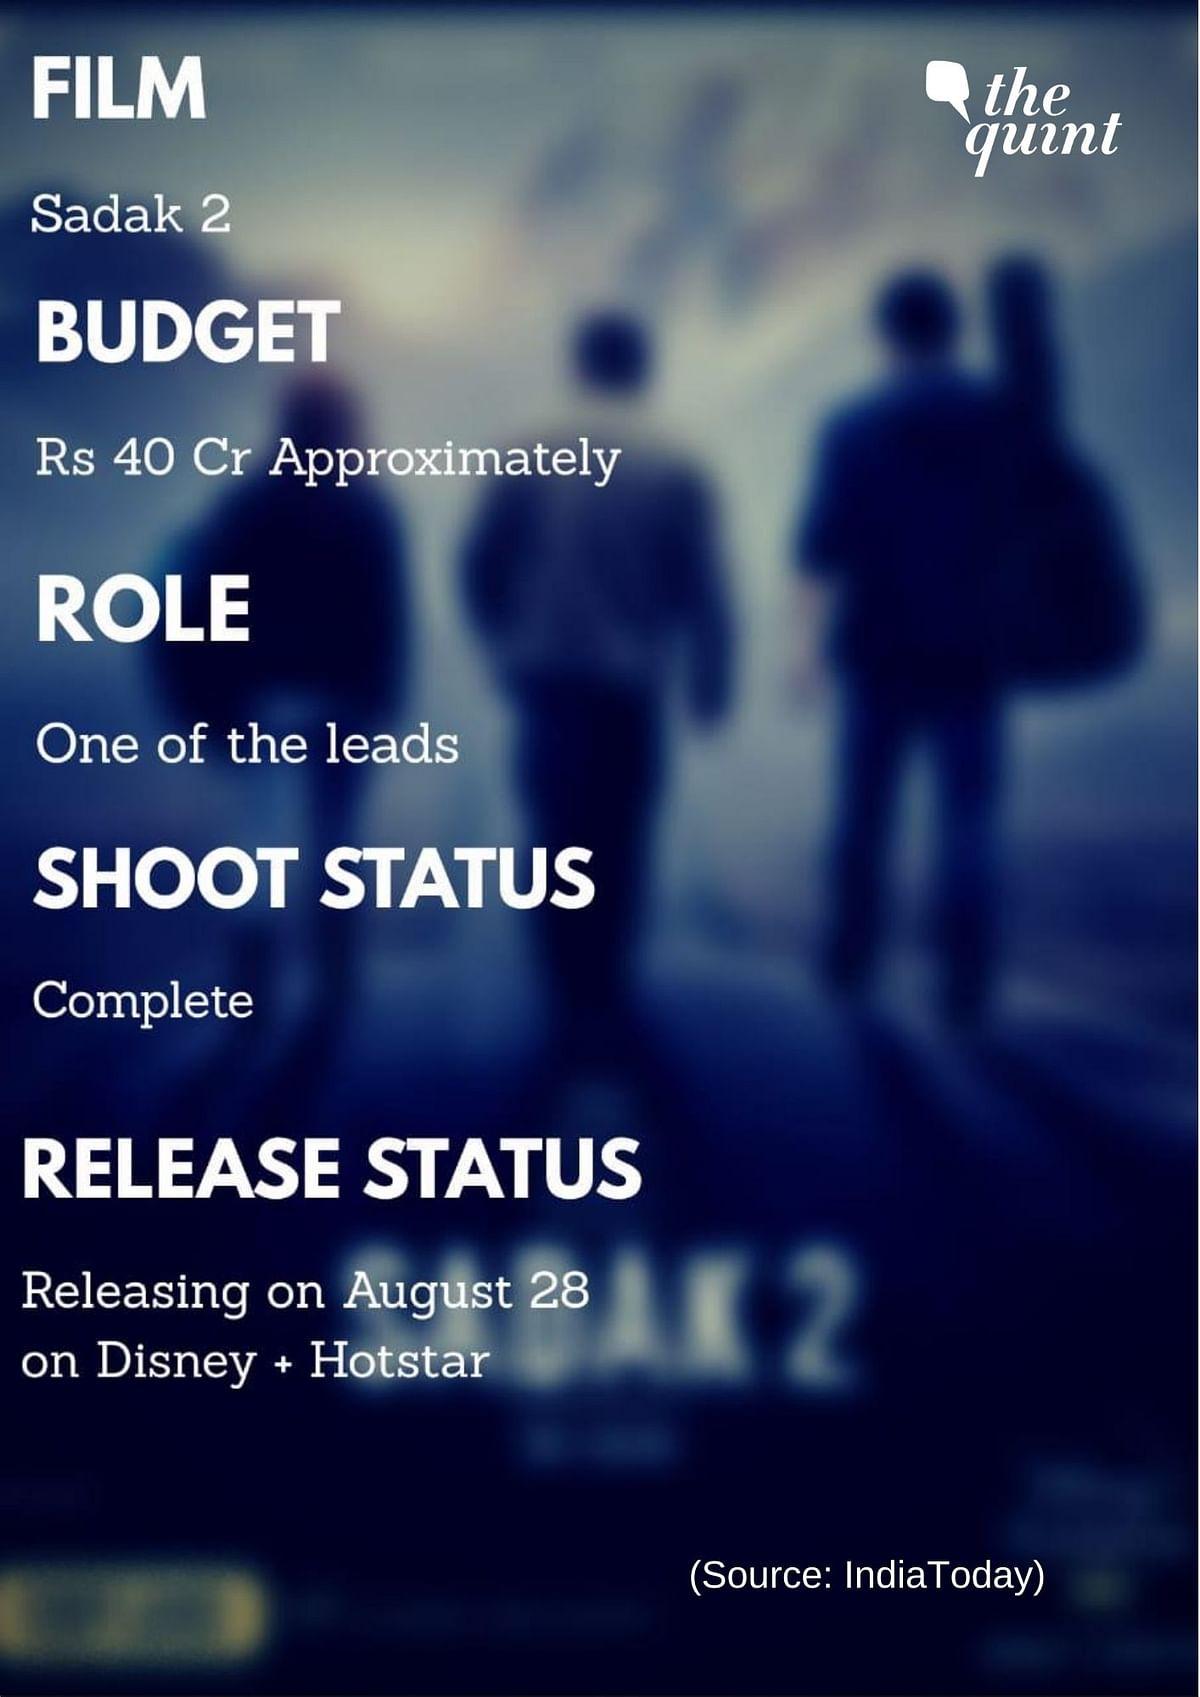 <i>Sadak 2</i> is a multi starrer film with Alia Bhatt, Aditya Roy Kapur and Sanjay Dutt playing the lead roles.